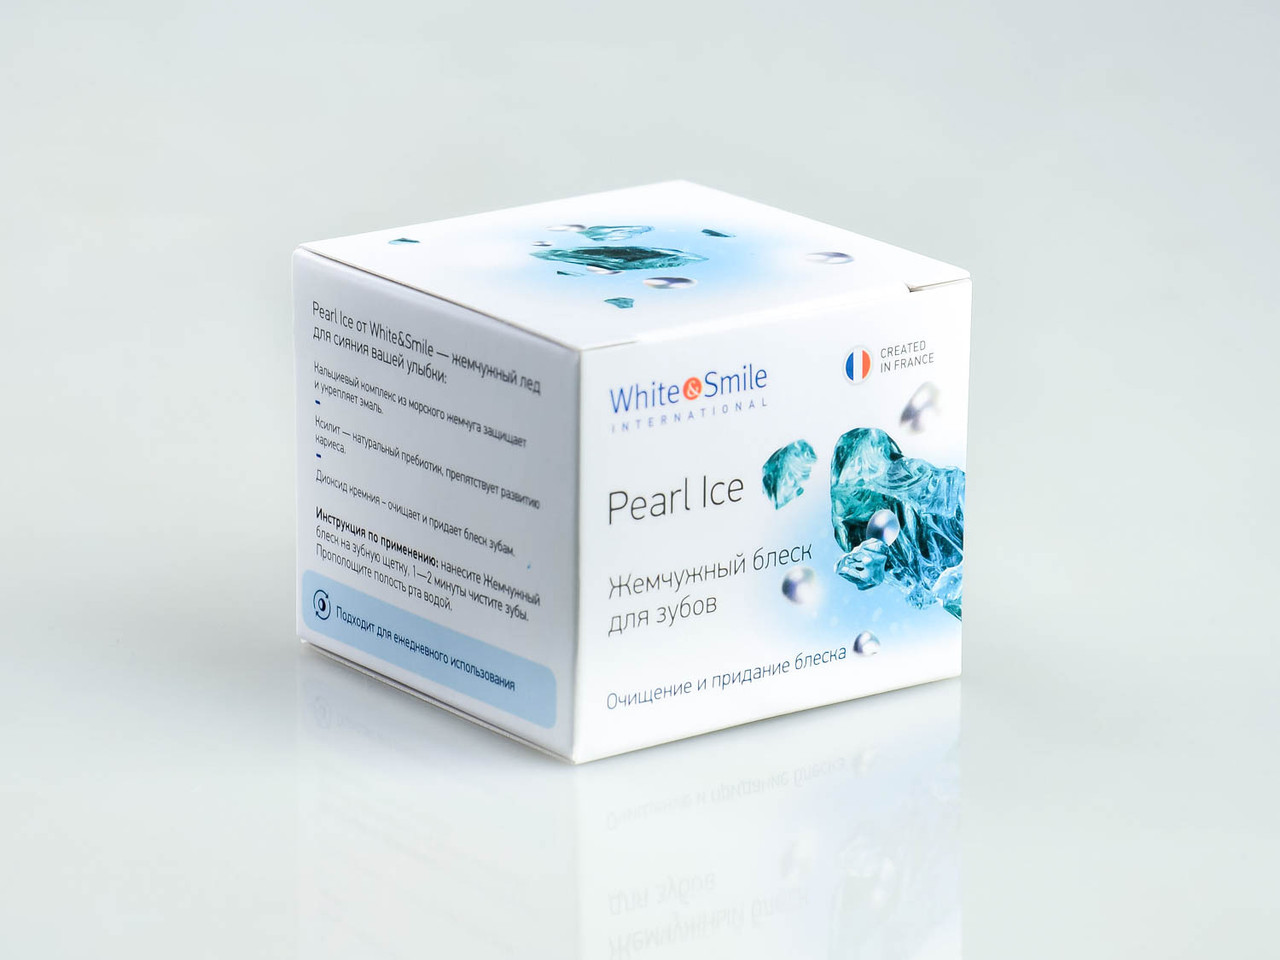 Жемчужный блеск для зубов Pearl Ice от White&Smile